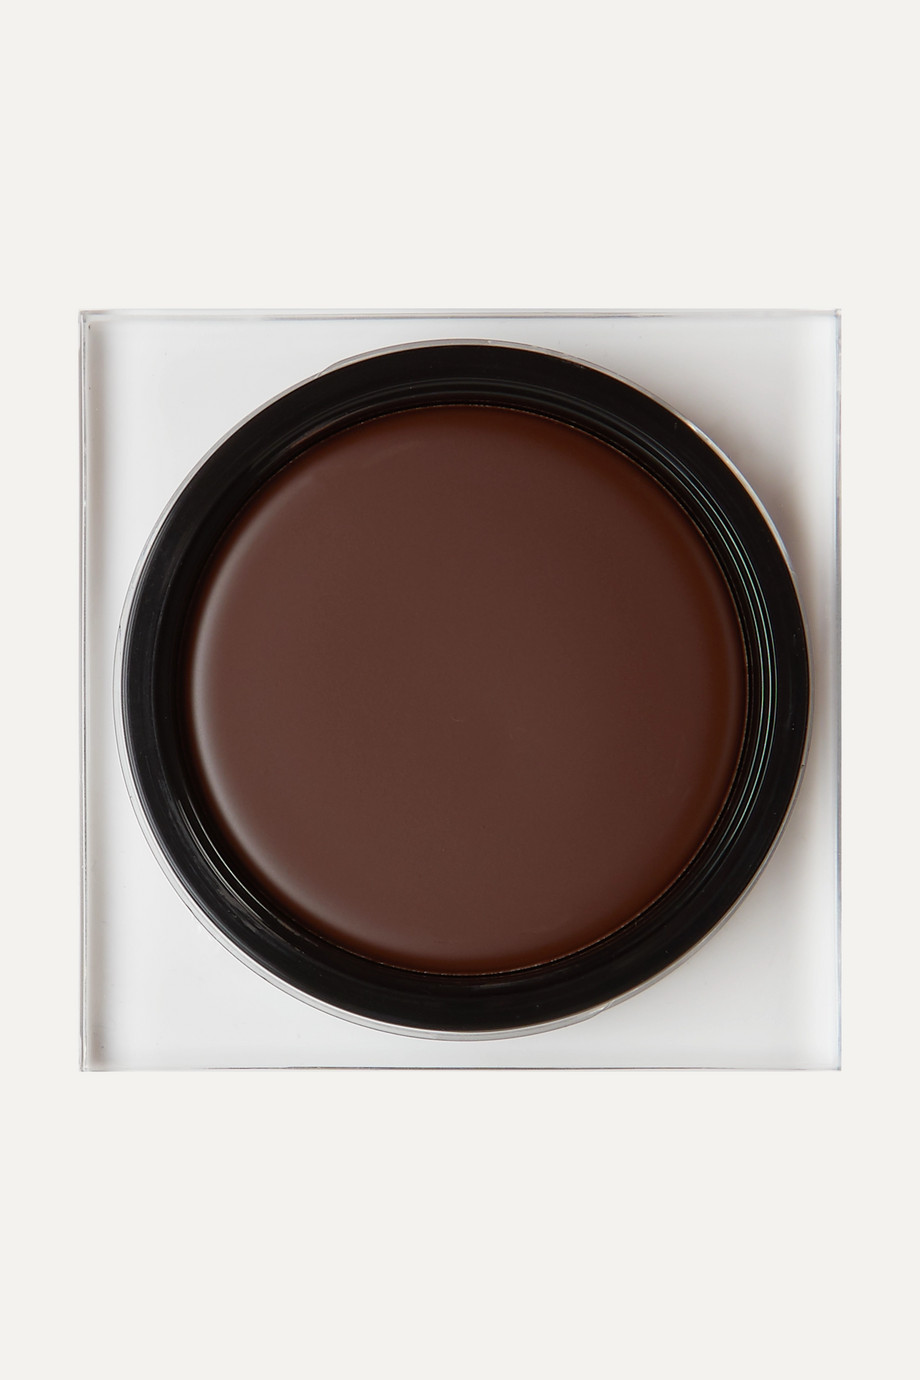 Huda Beauty Tantour Contour & Bronzer Cream - Tan